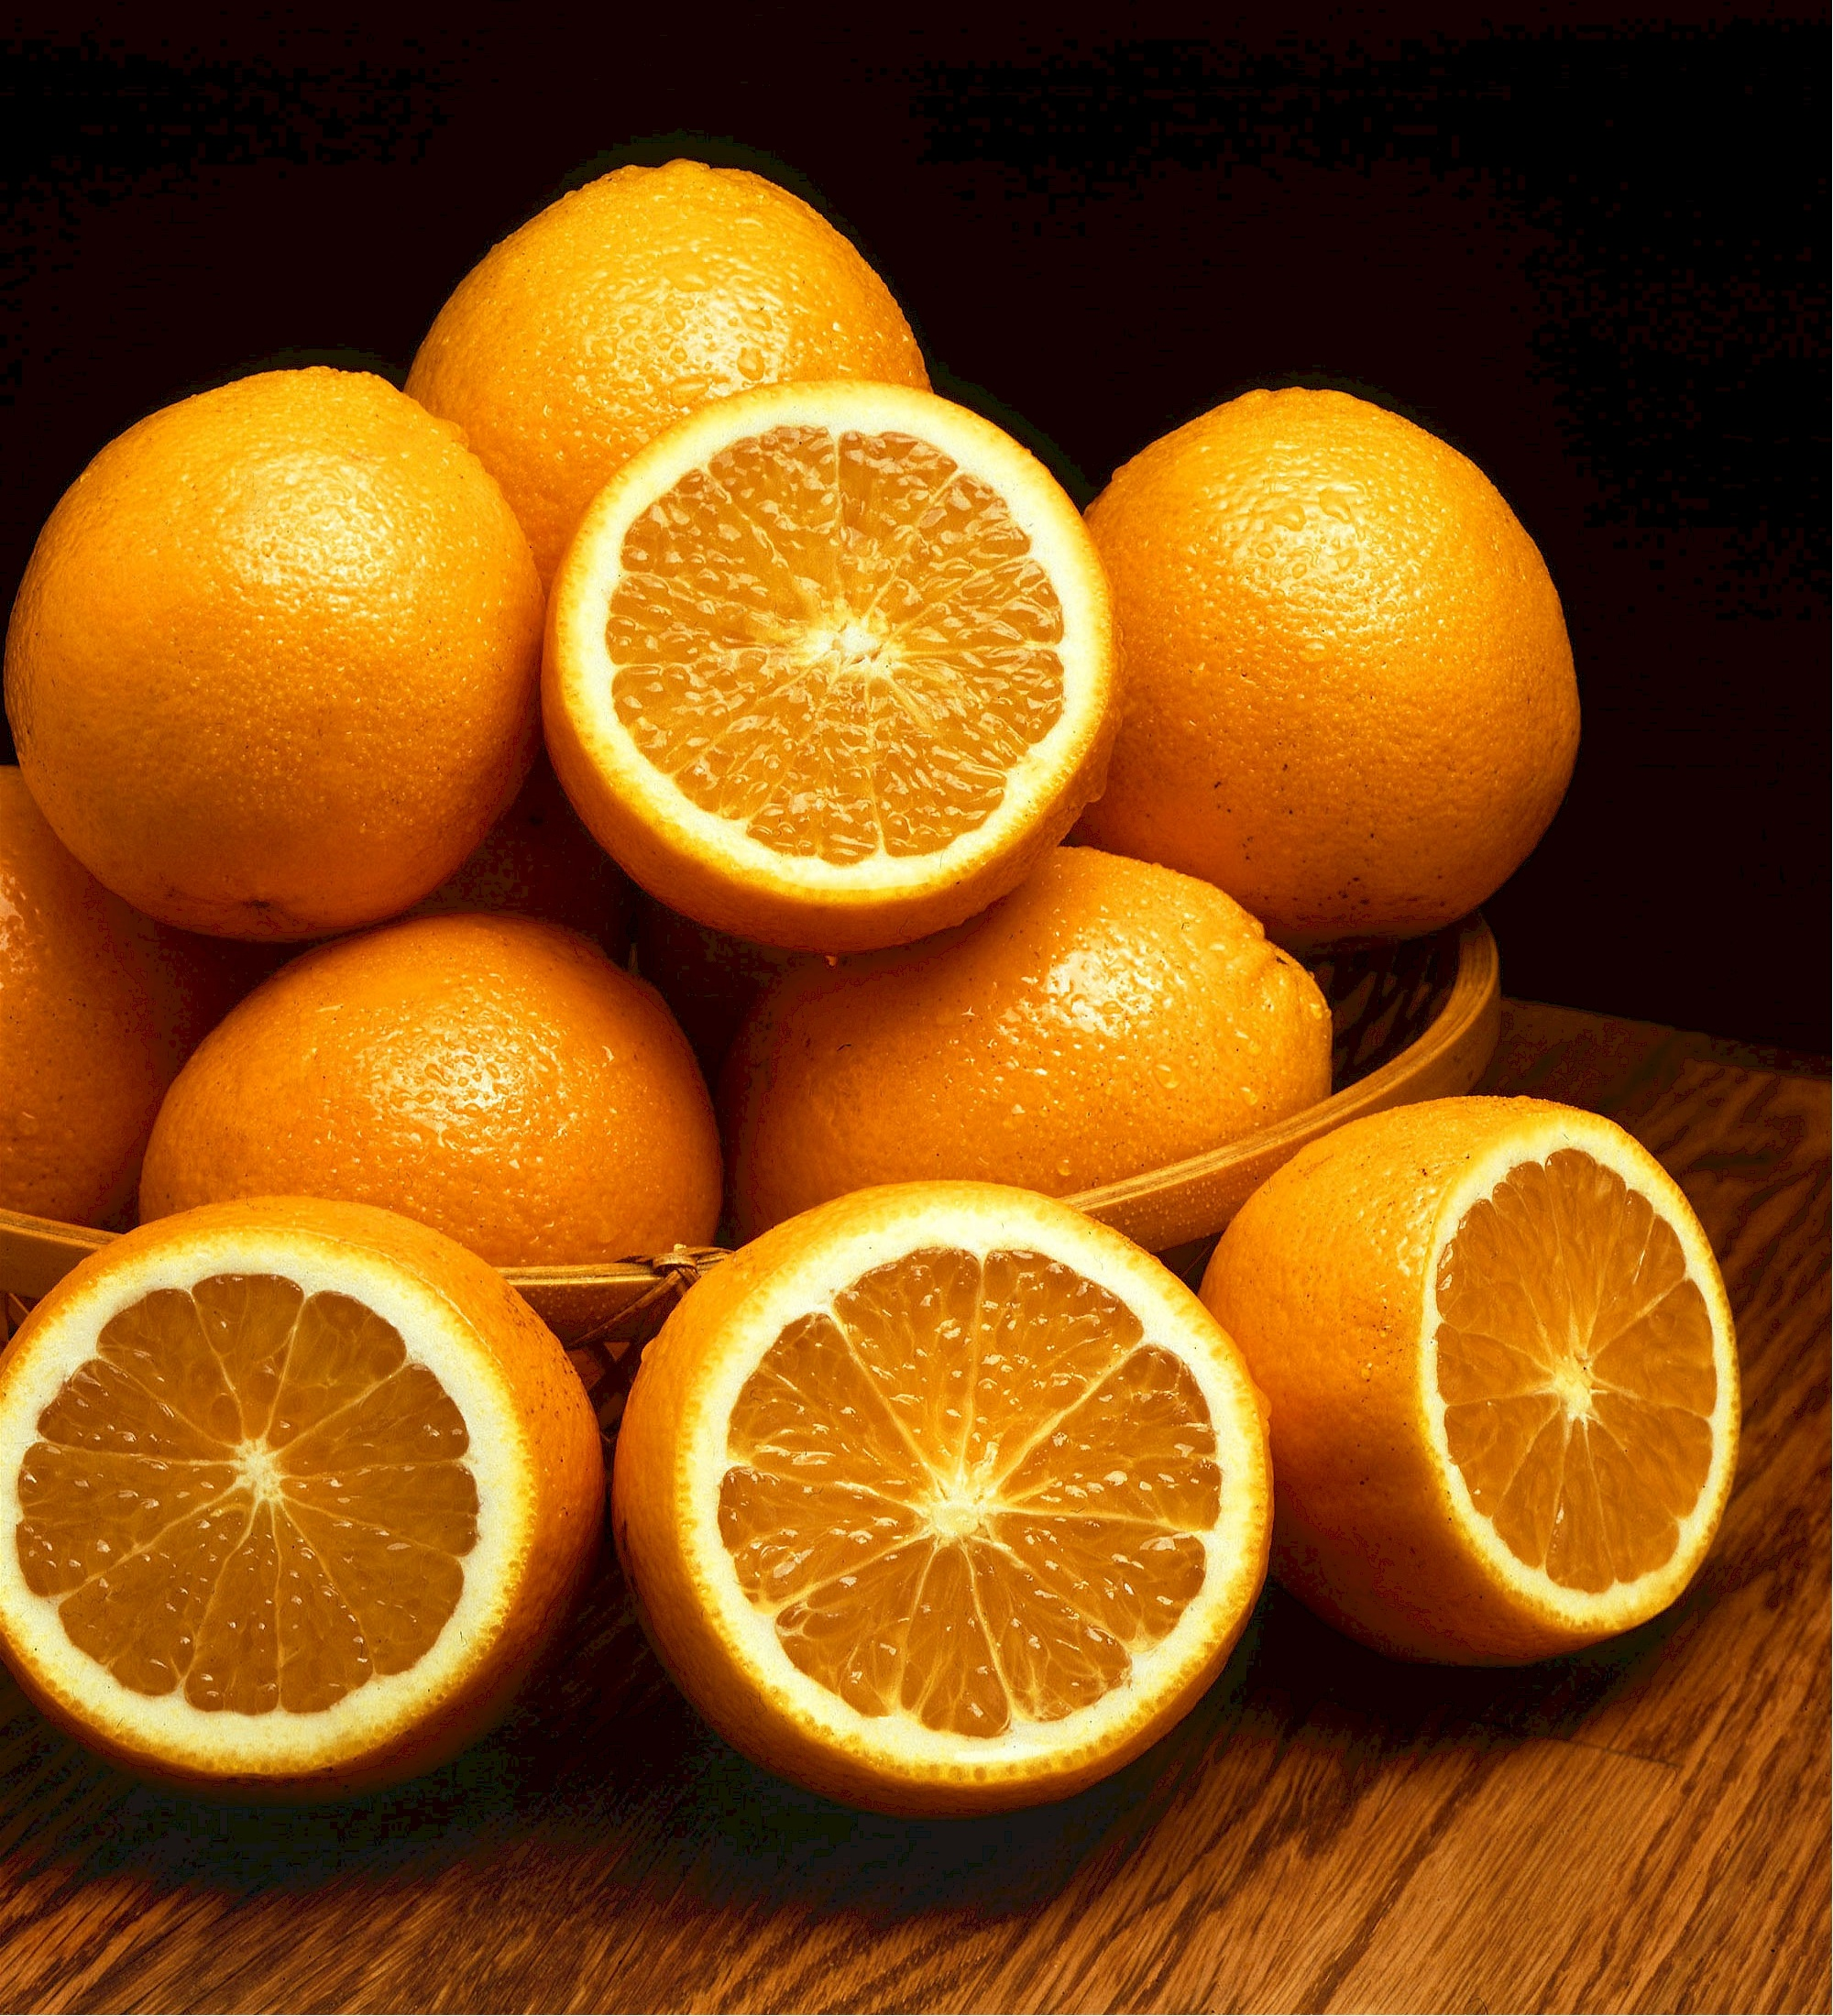 Juicy oranges photo